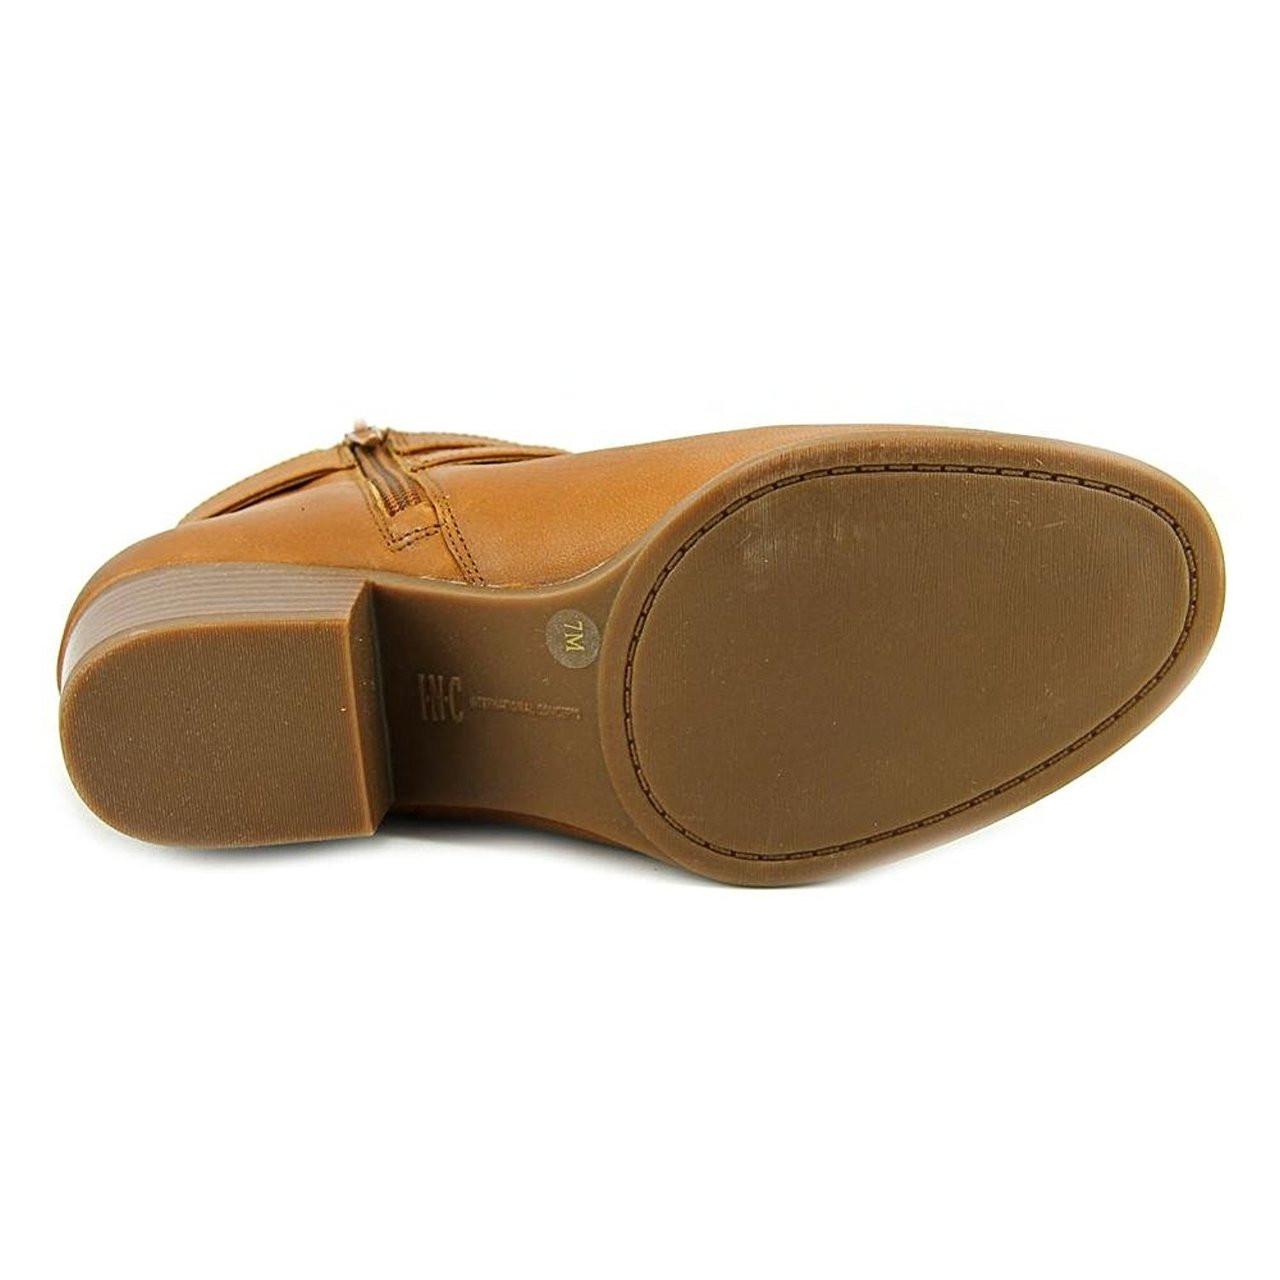 cfad41f8f812 INC International Concepts Womens Herbii Closed Toe Ankle Fashion Boots~pp-2f36fec0  ...